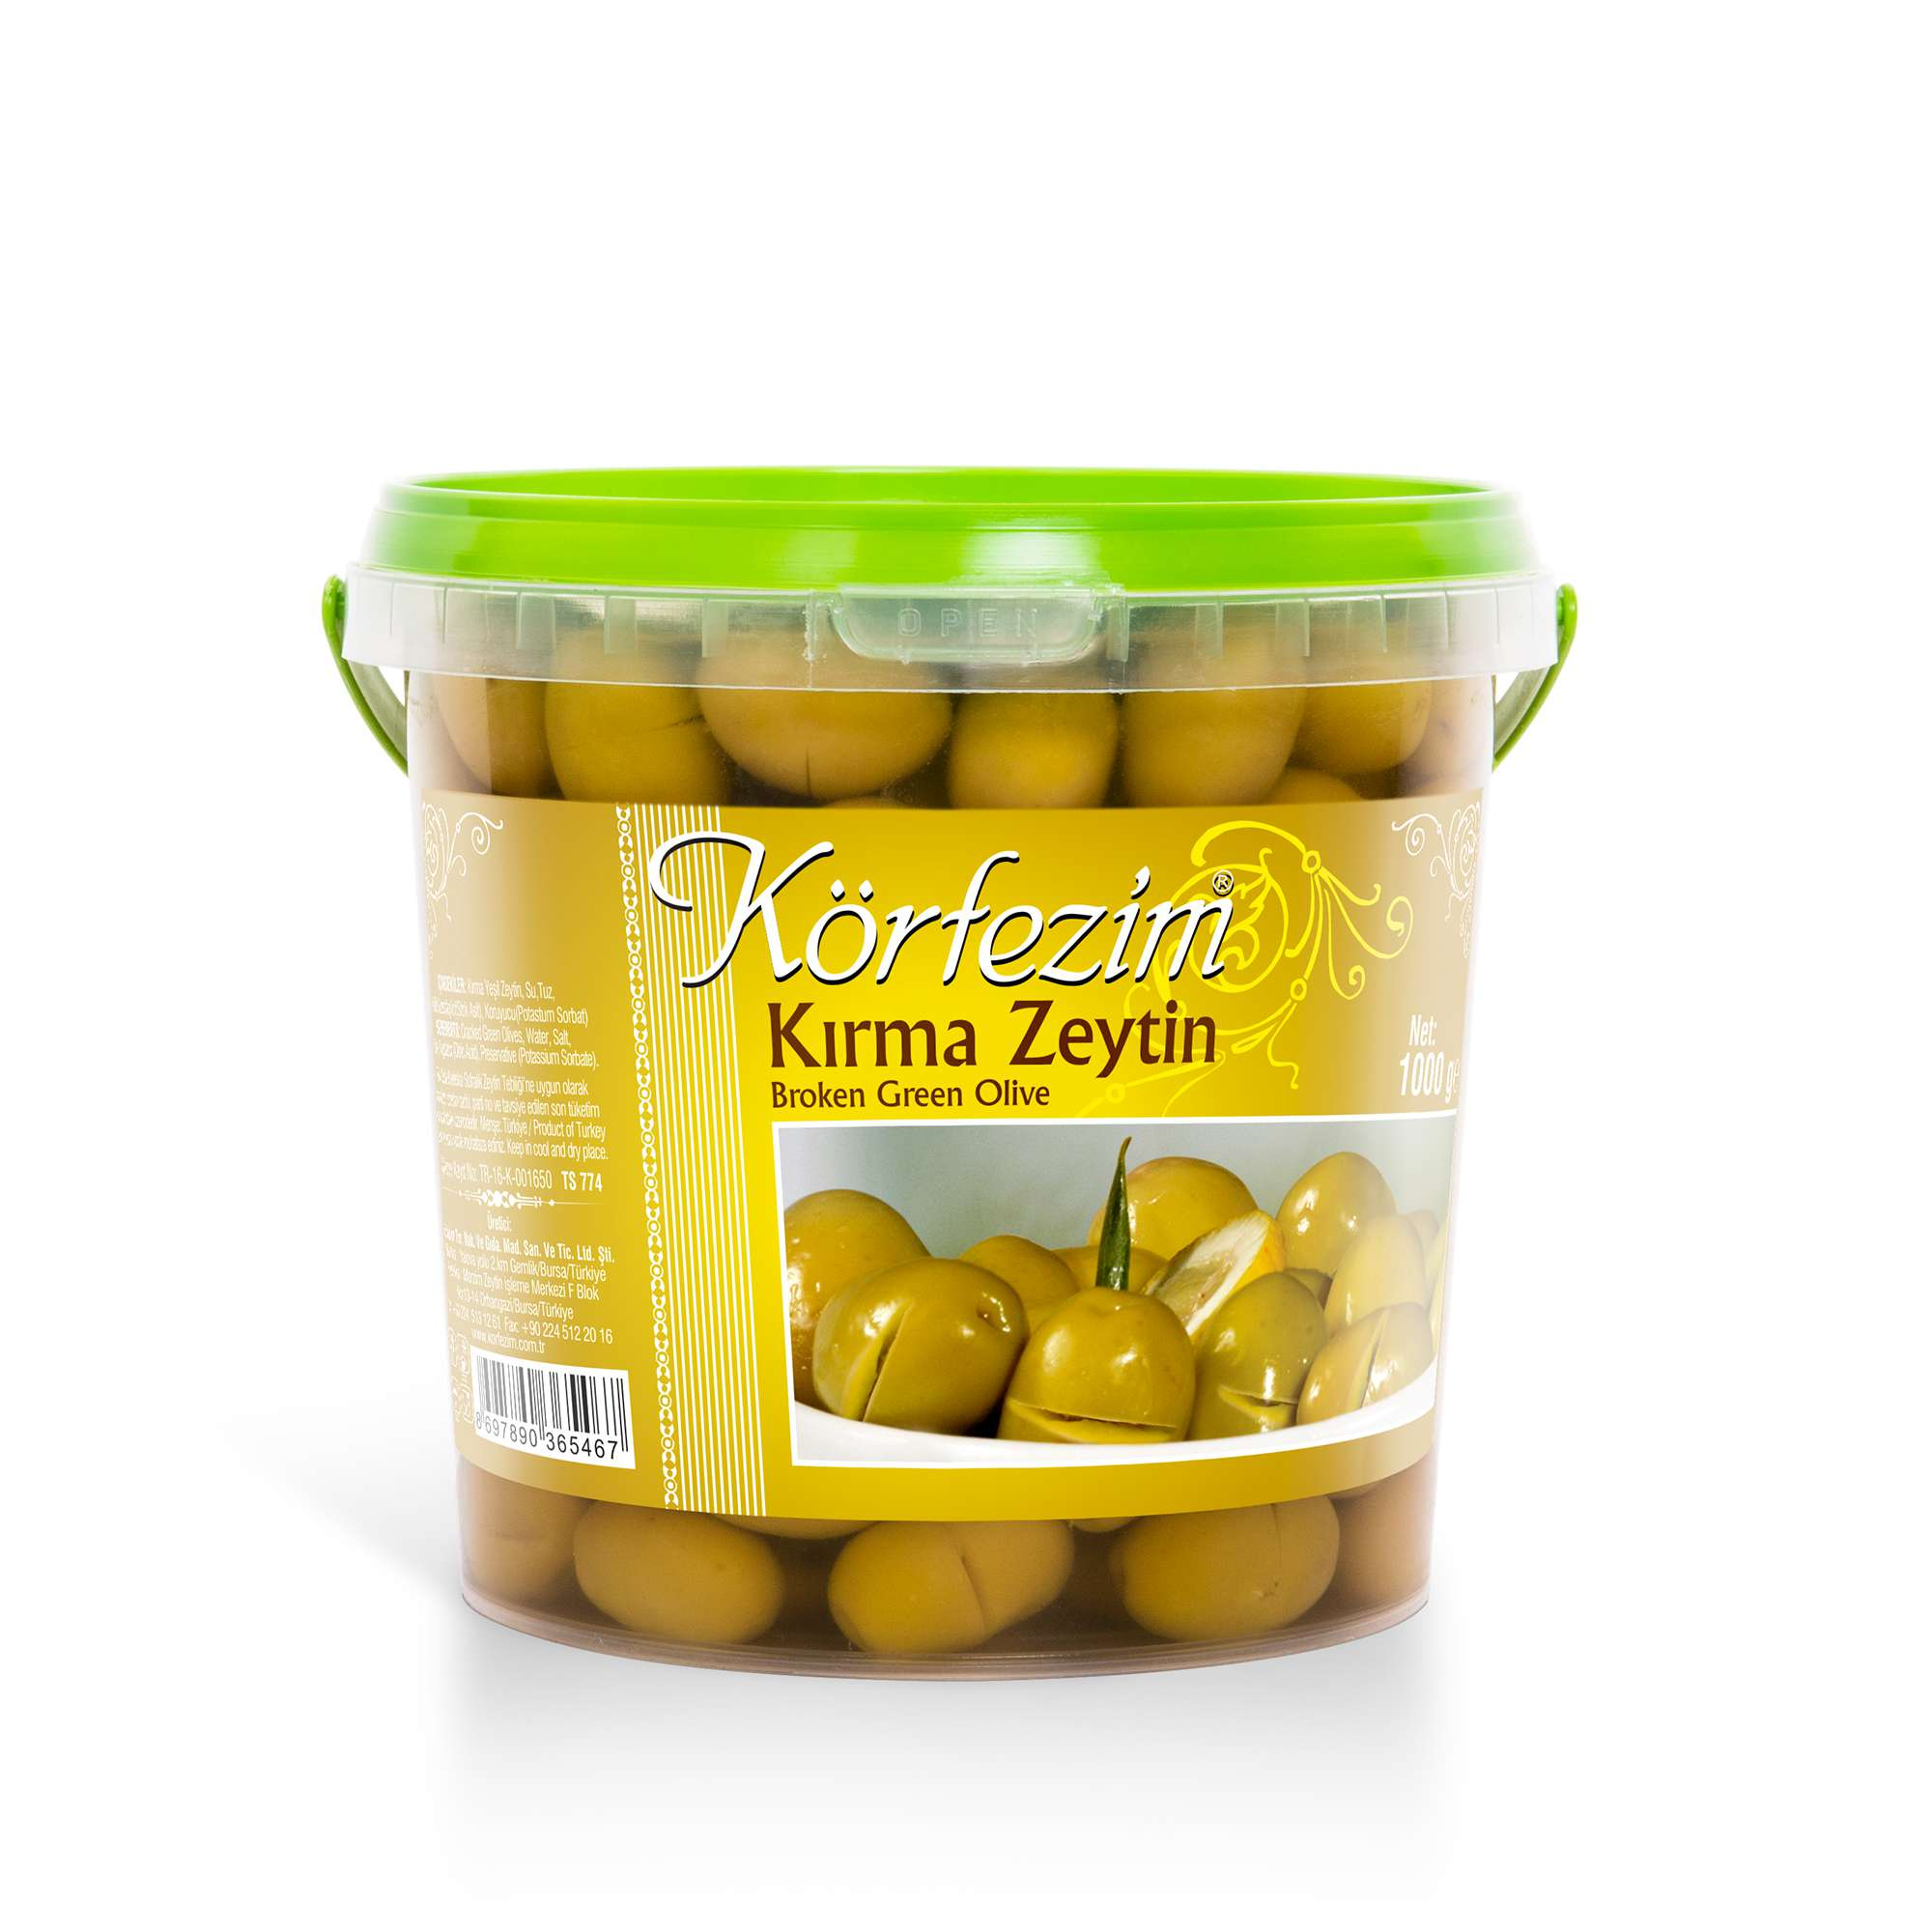 Körfezim Kırma Yeşil Zeytin - 1 kg (Pet Kova)